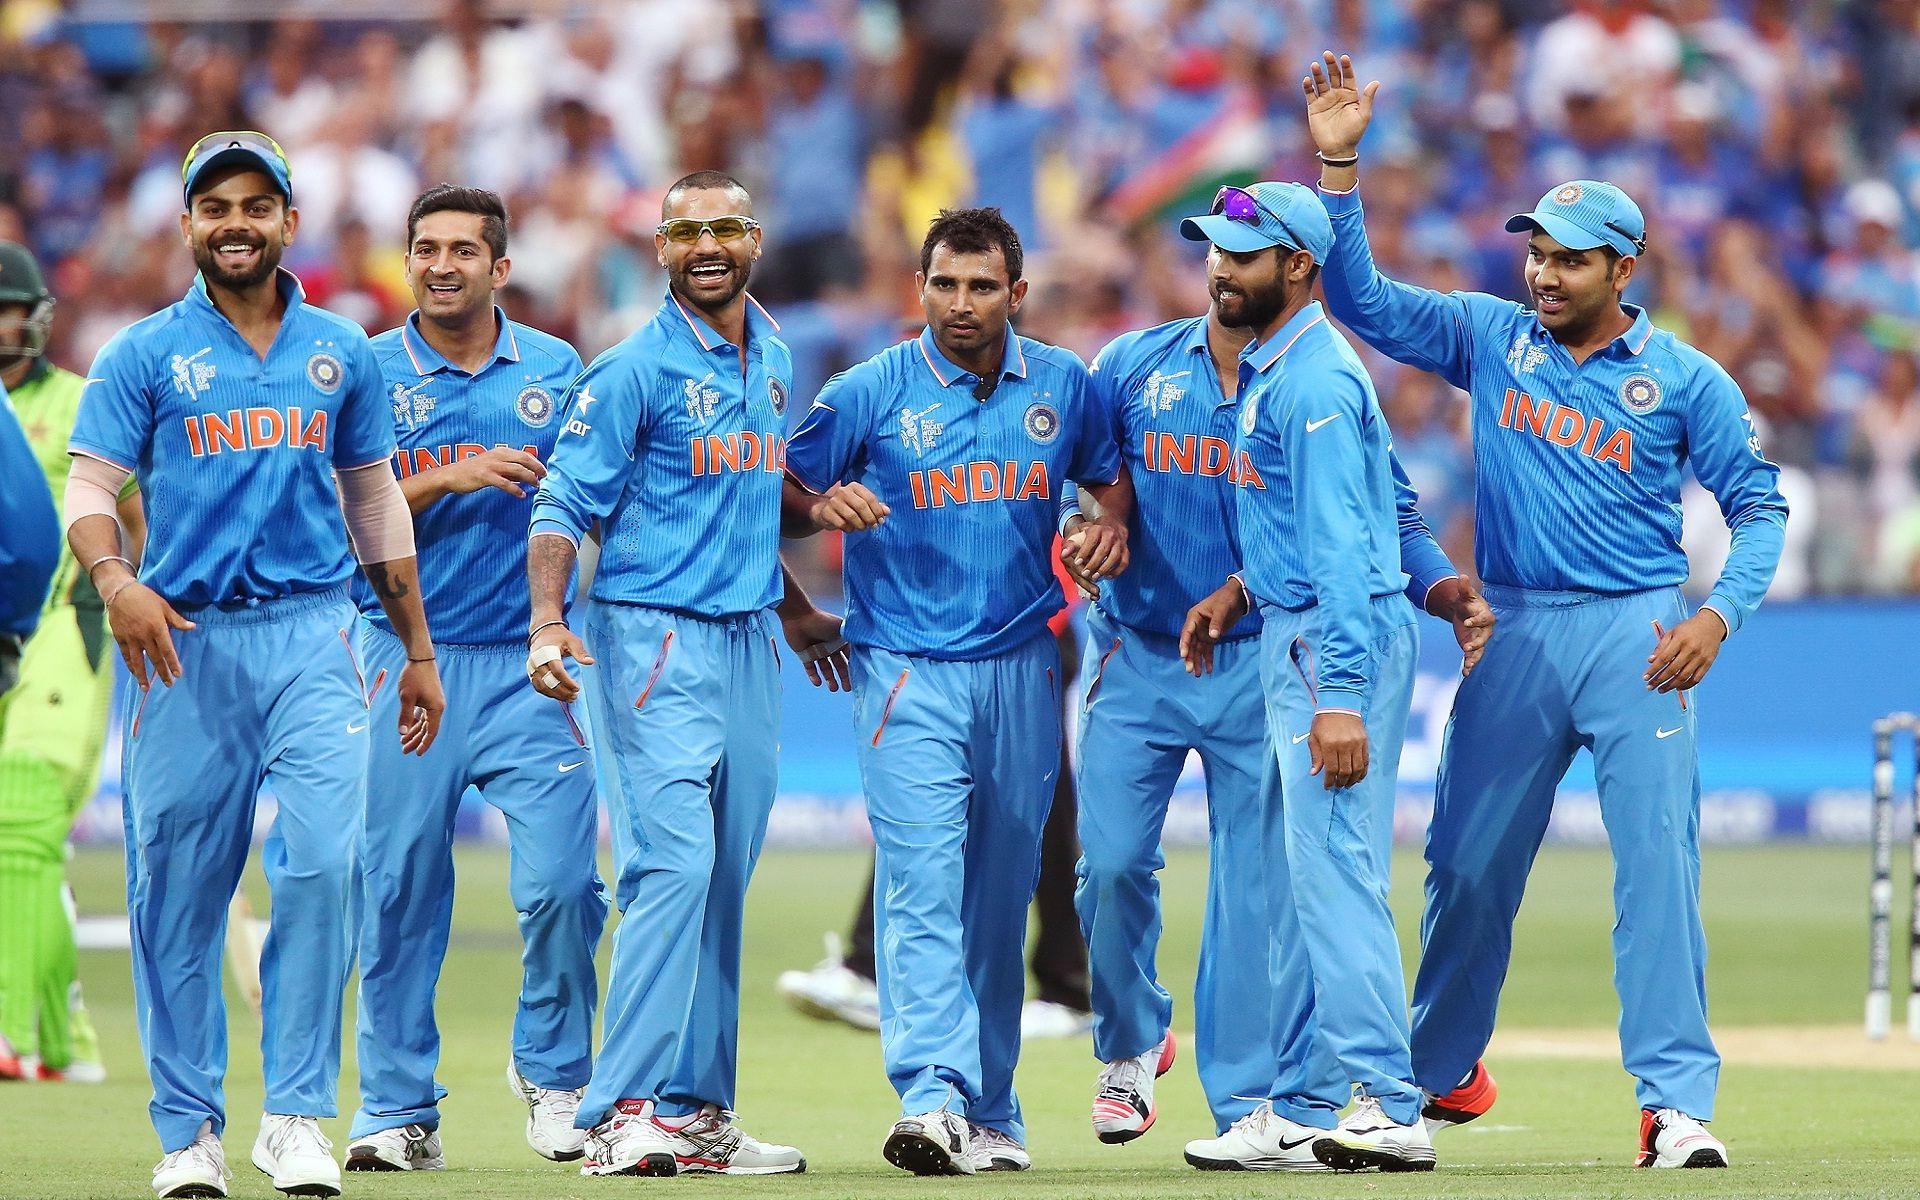 Bcci Announces Indian Cricket Team Schedule For 2019 20 Season